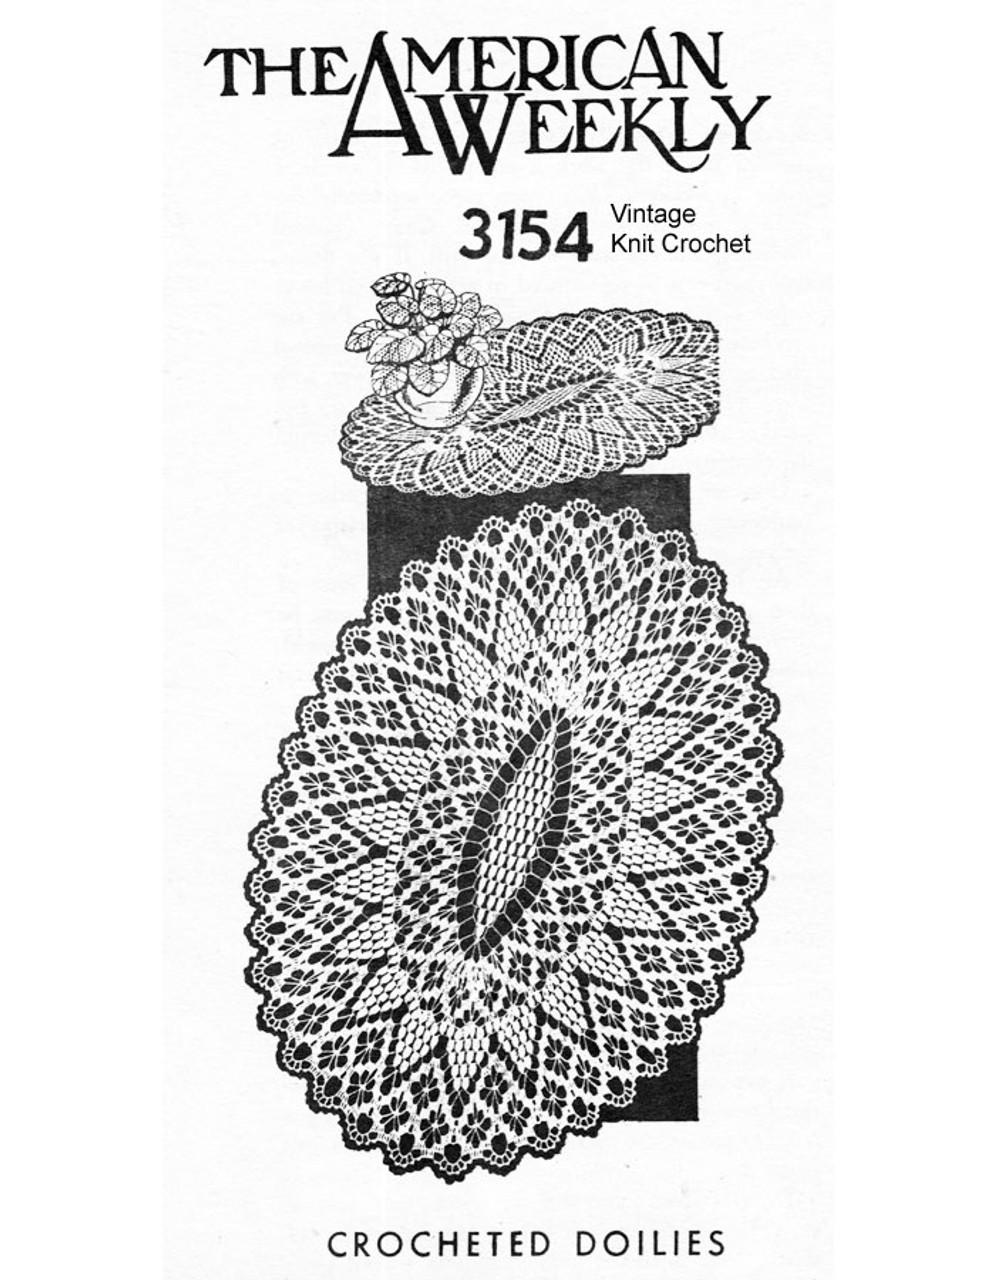 Oval Spiderweb Crochet Doily Pattern No 3154